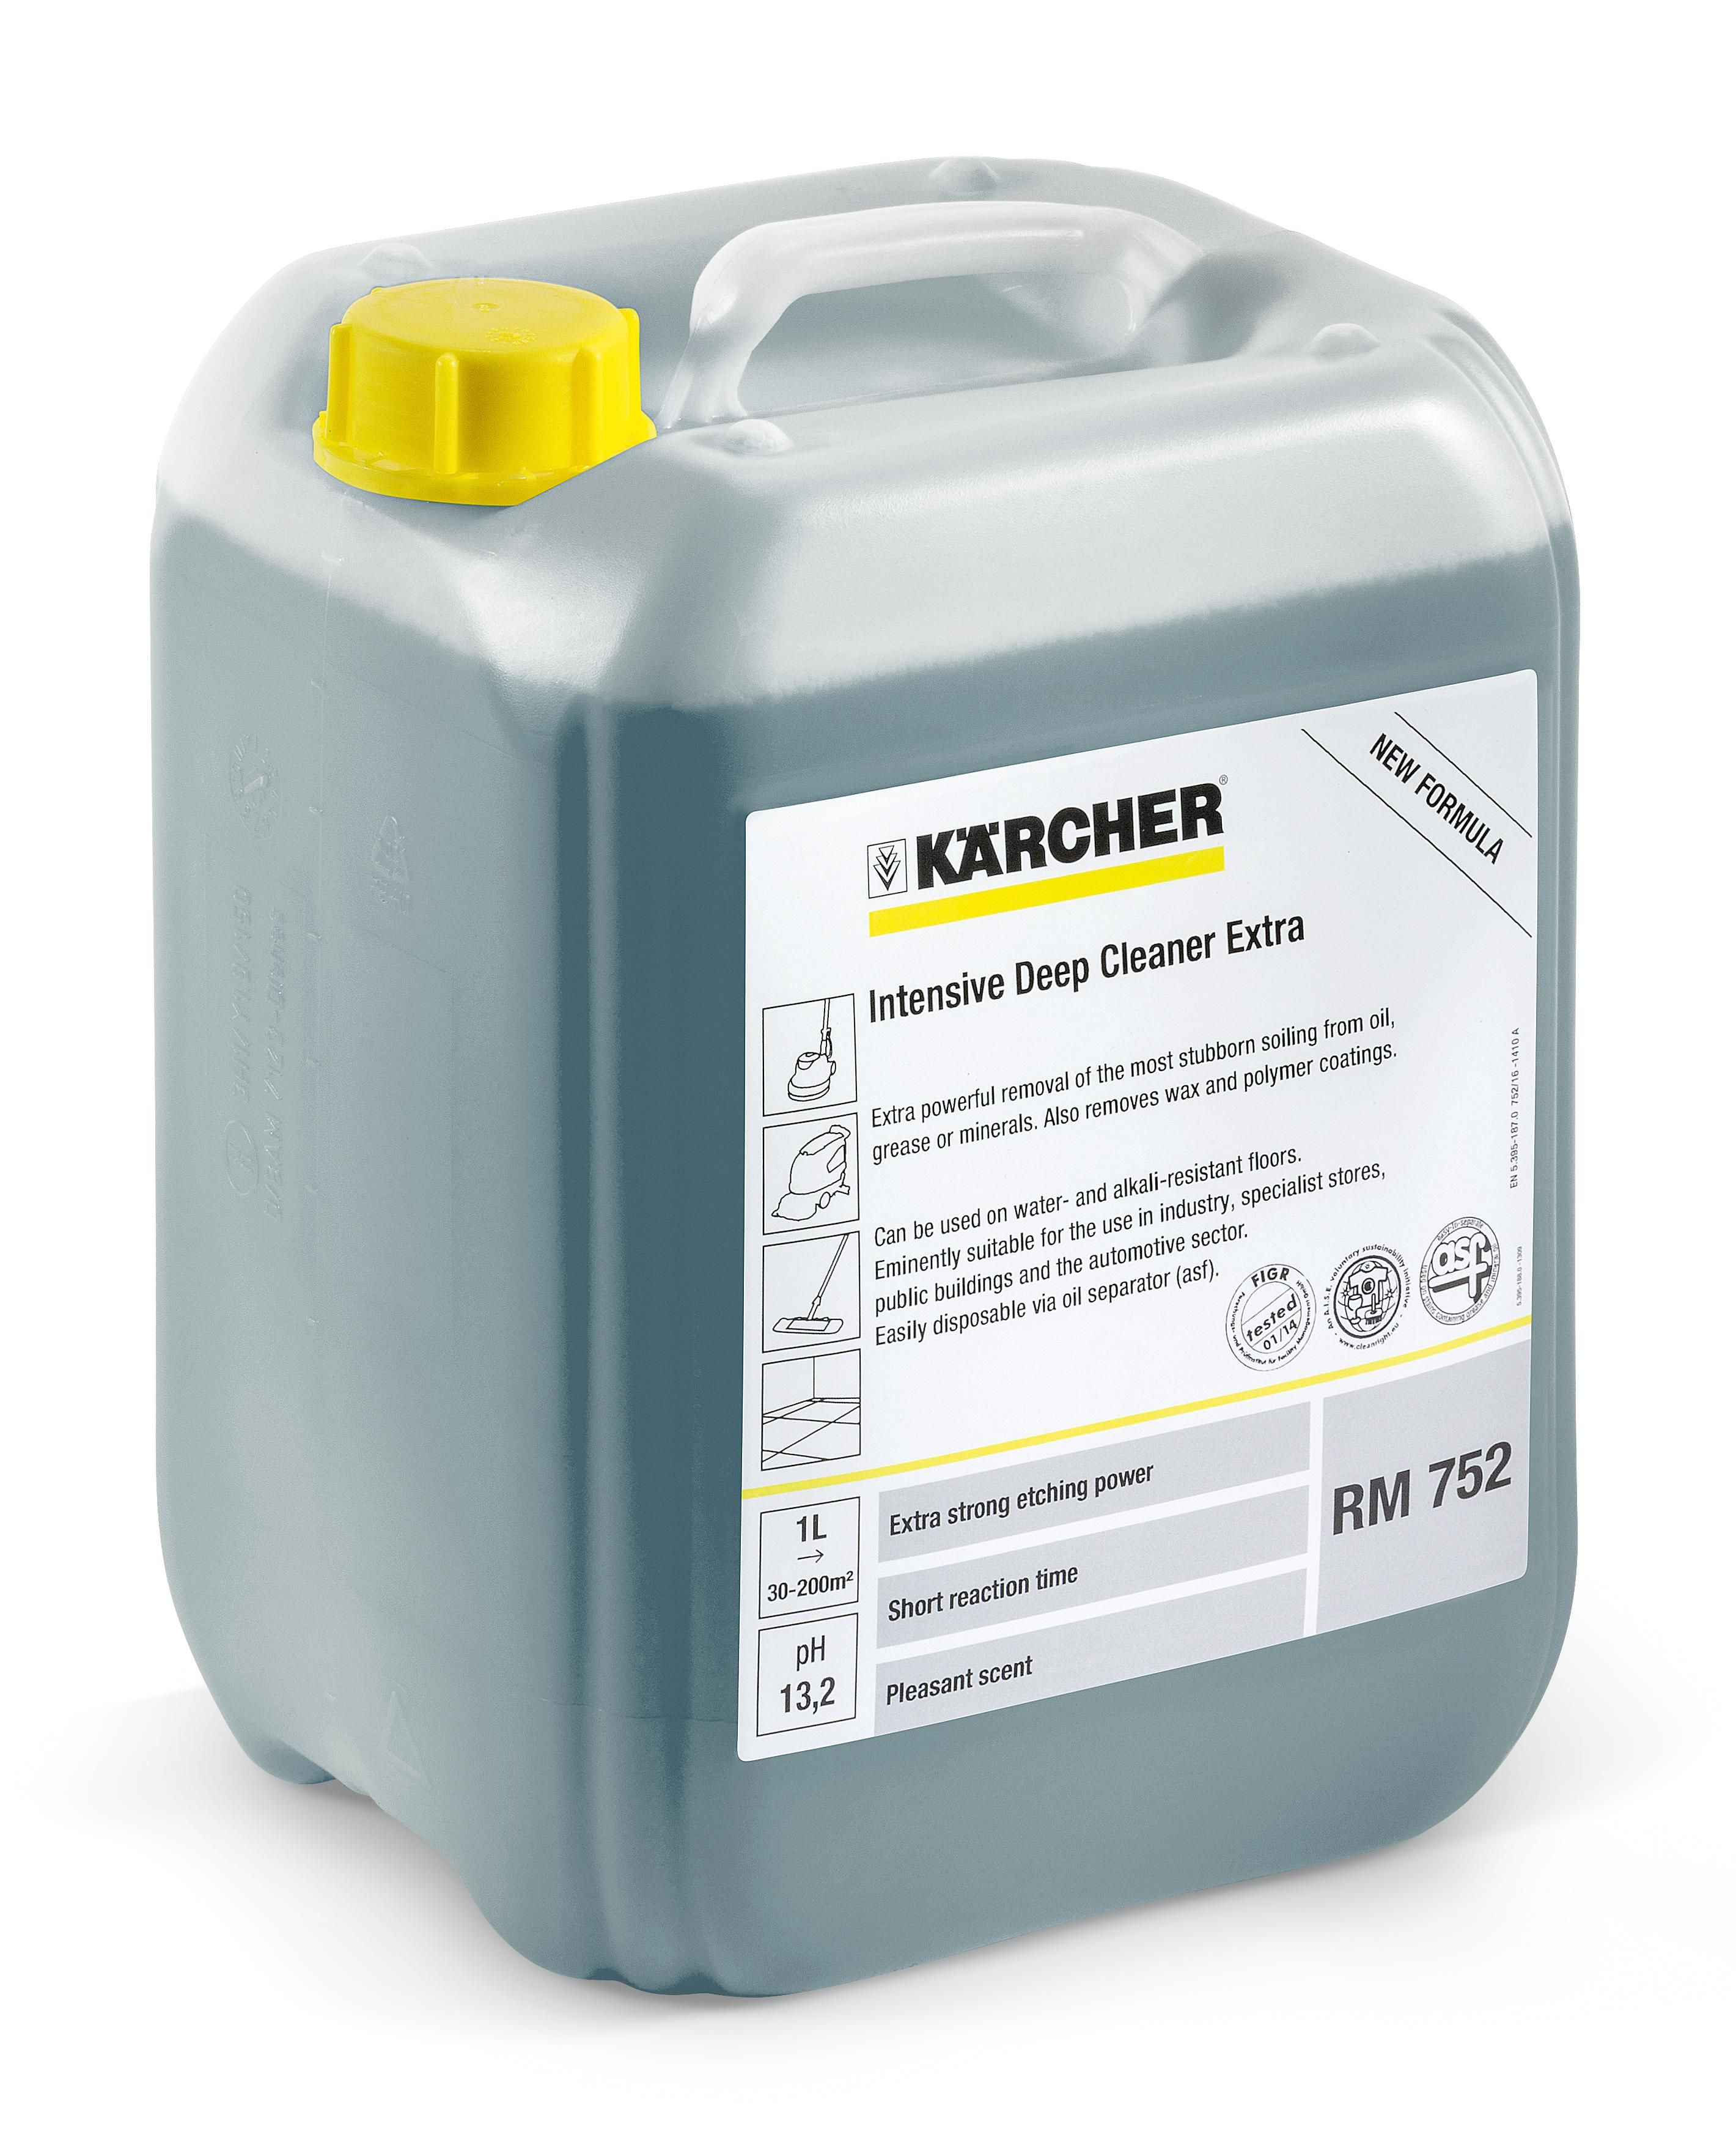 Kärcher Rengjøring RM 752 ASF 10L (flaske med 10 l) 6.295-813.0